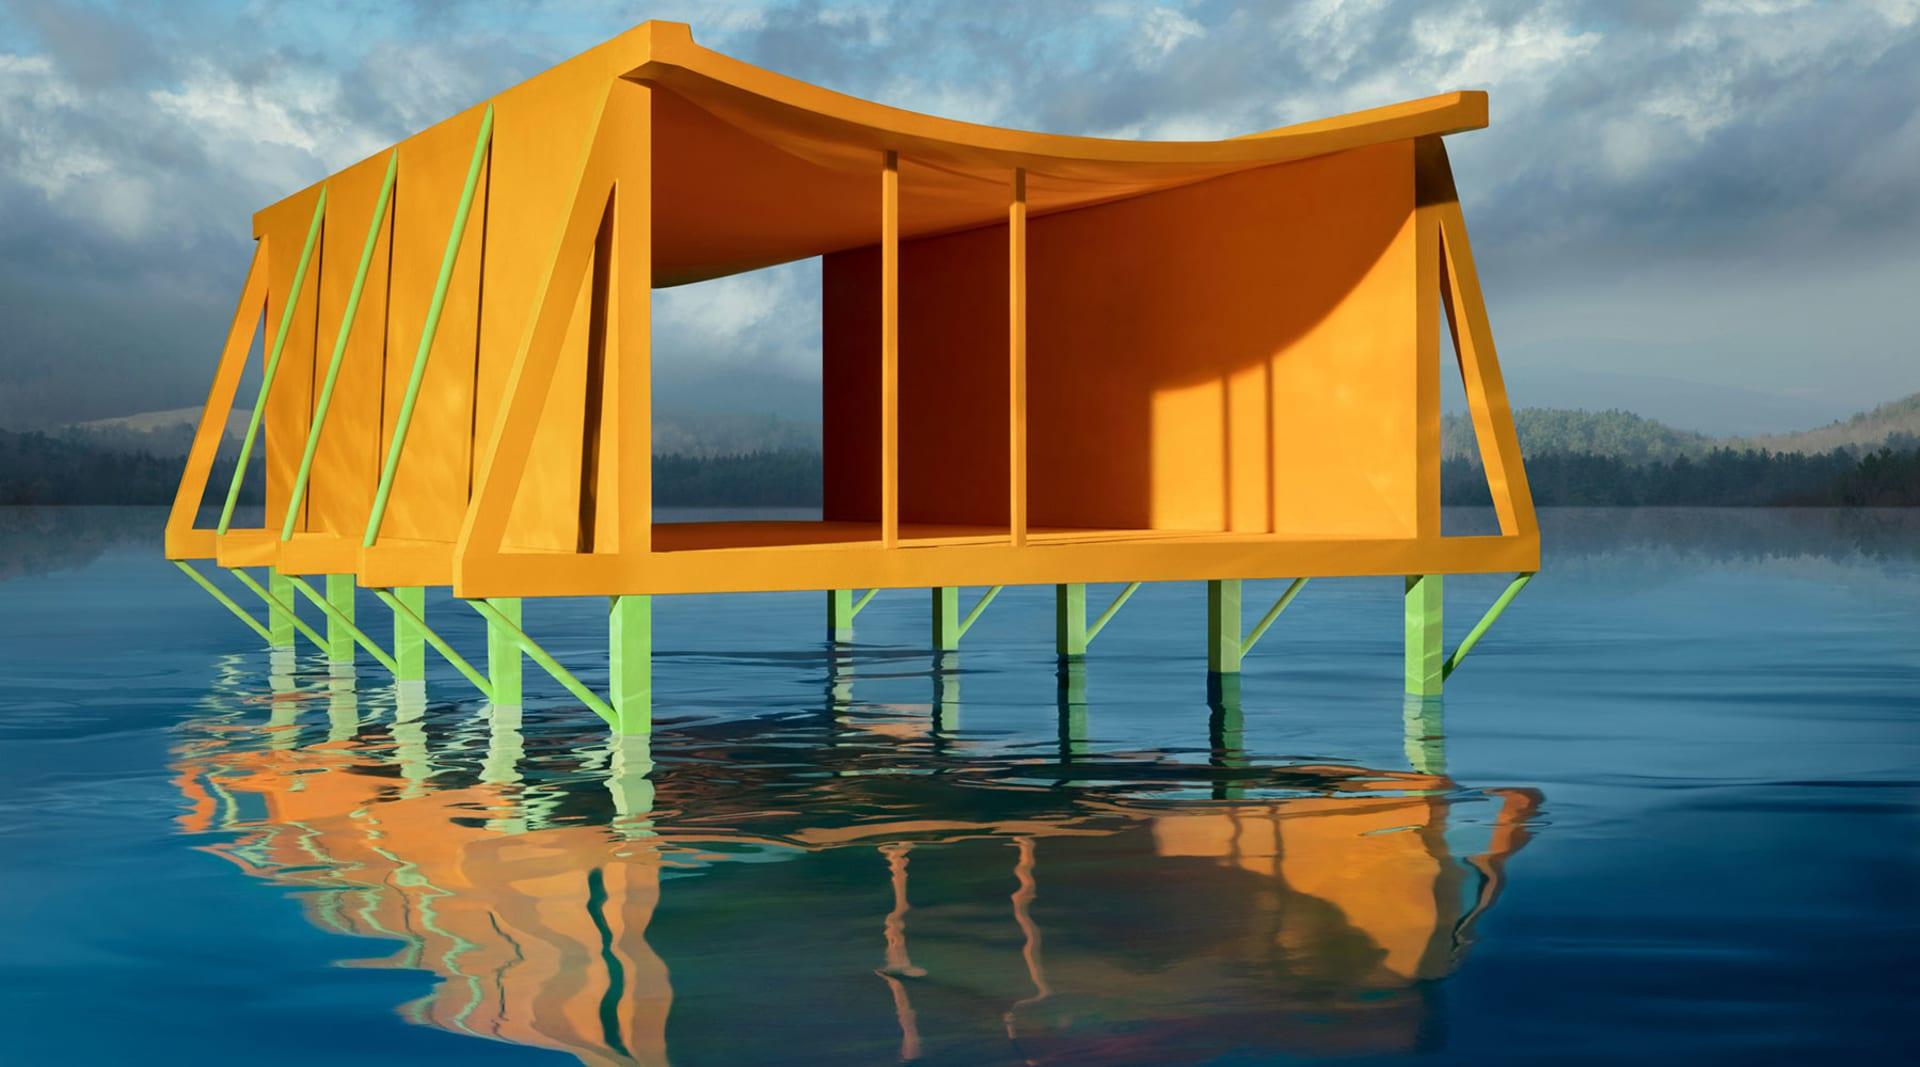 HERO JC Orange House on Water 2019